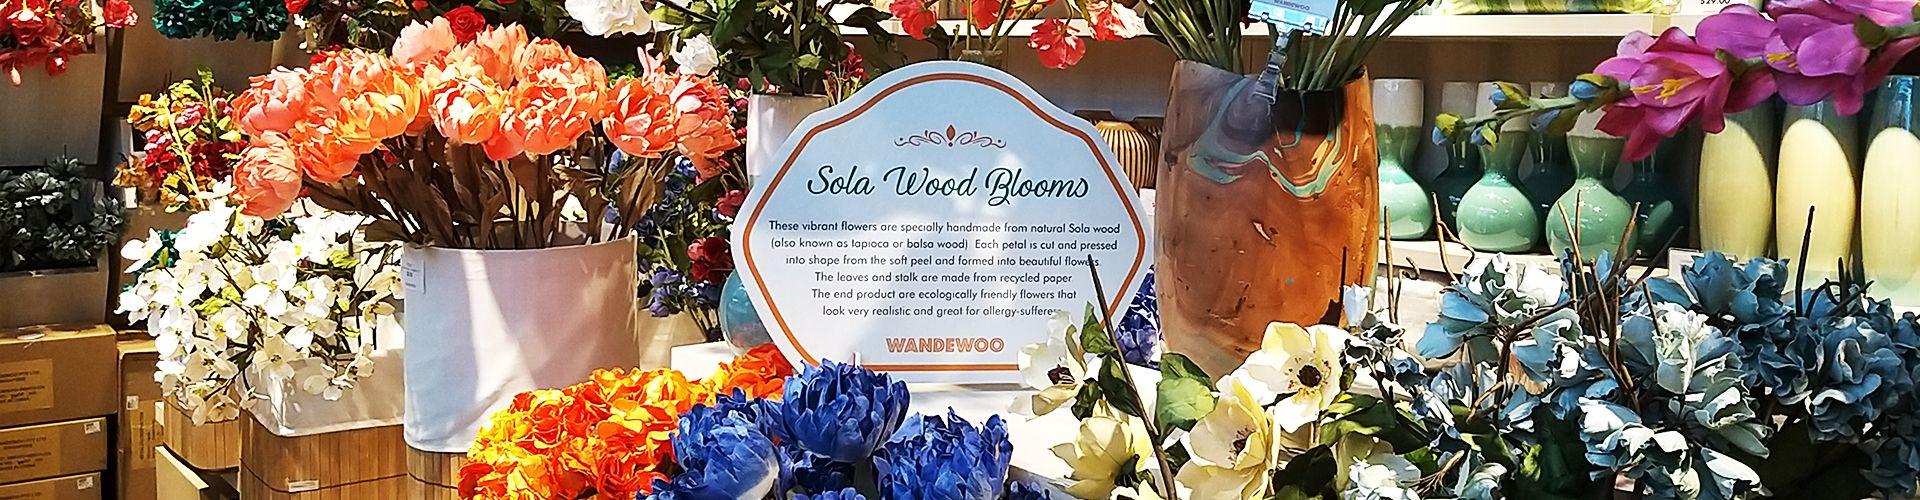 Handmade Decorative Flowers Wandewoo